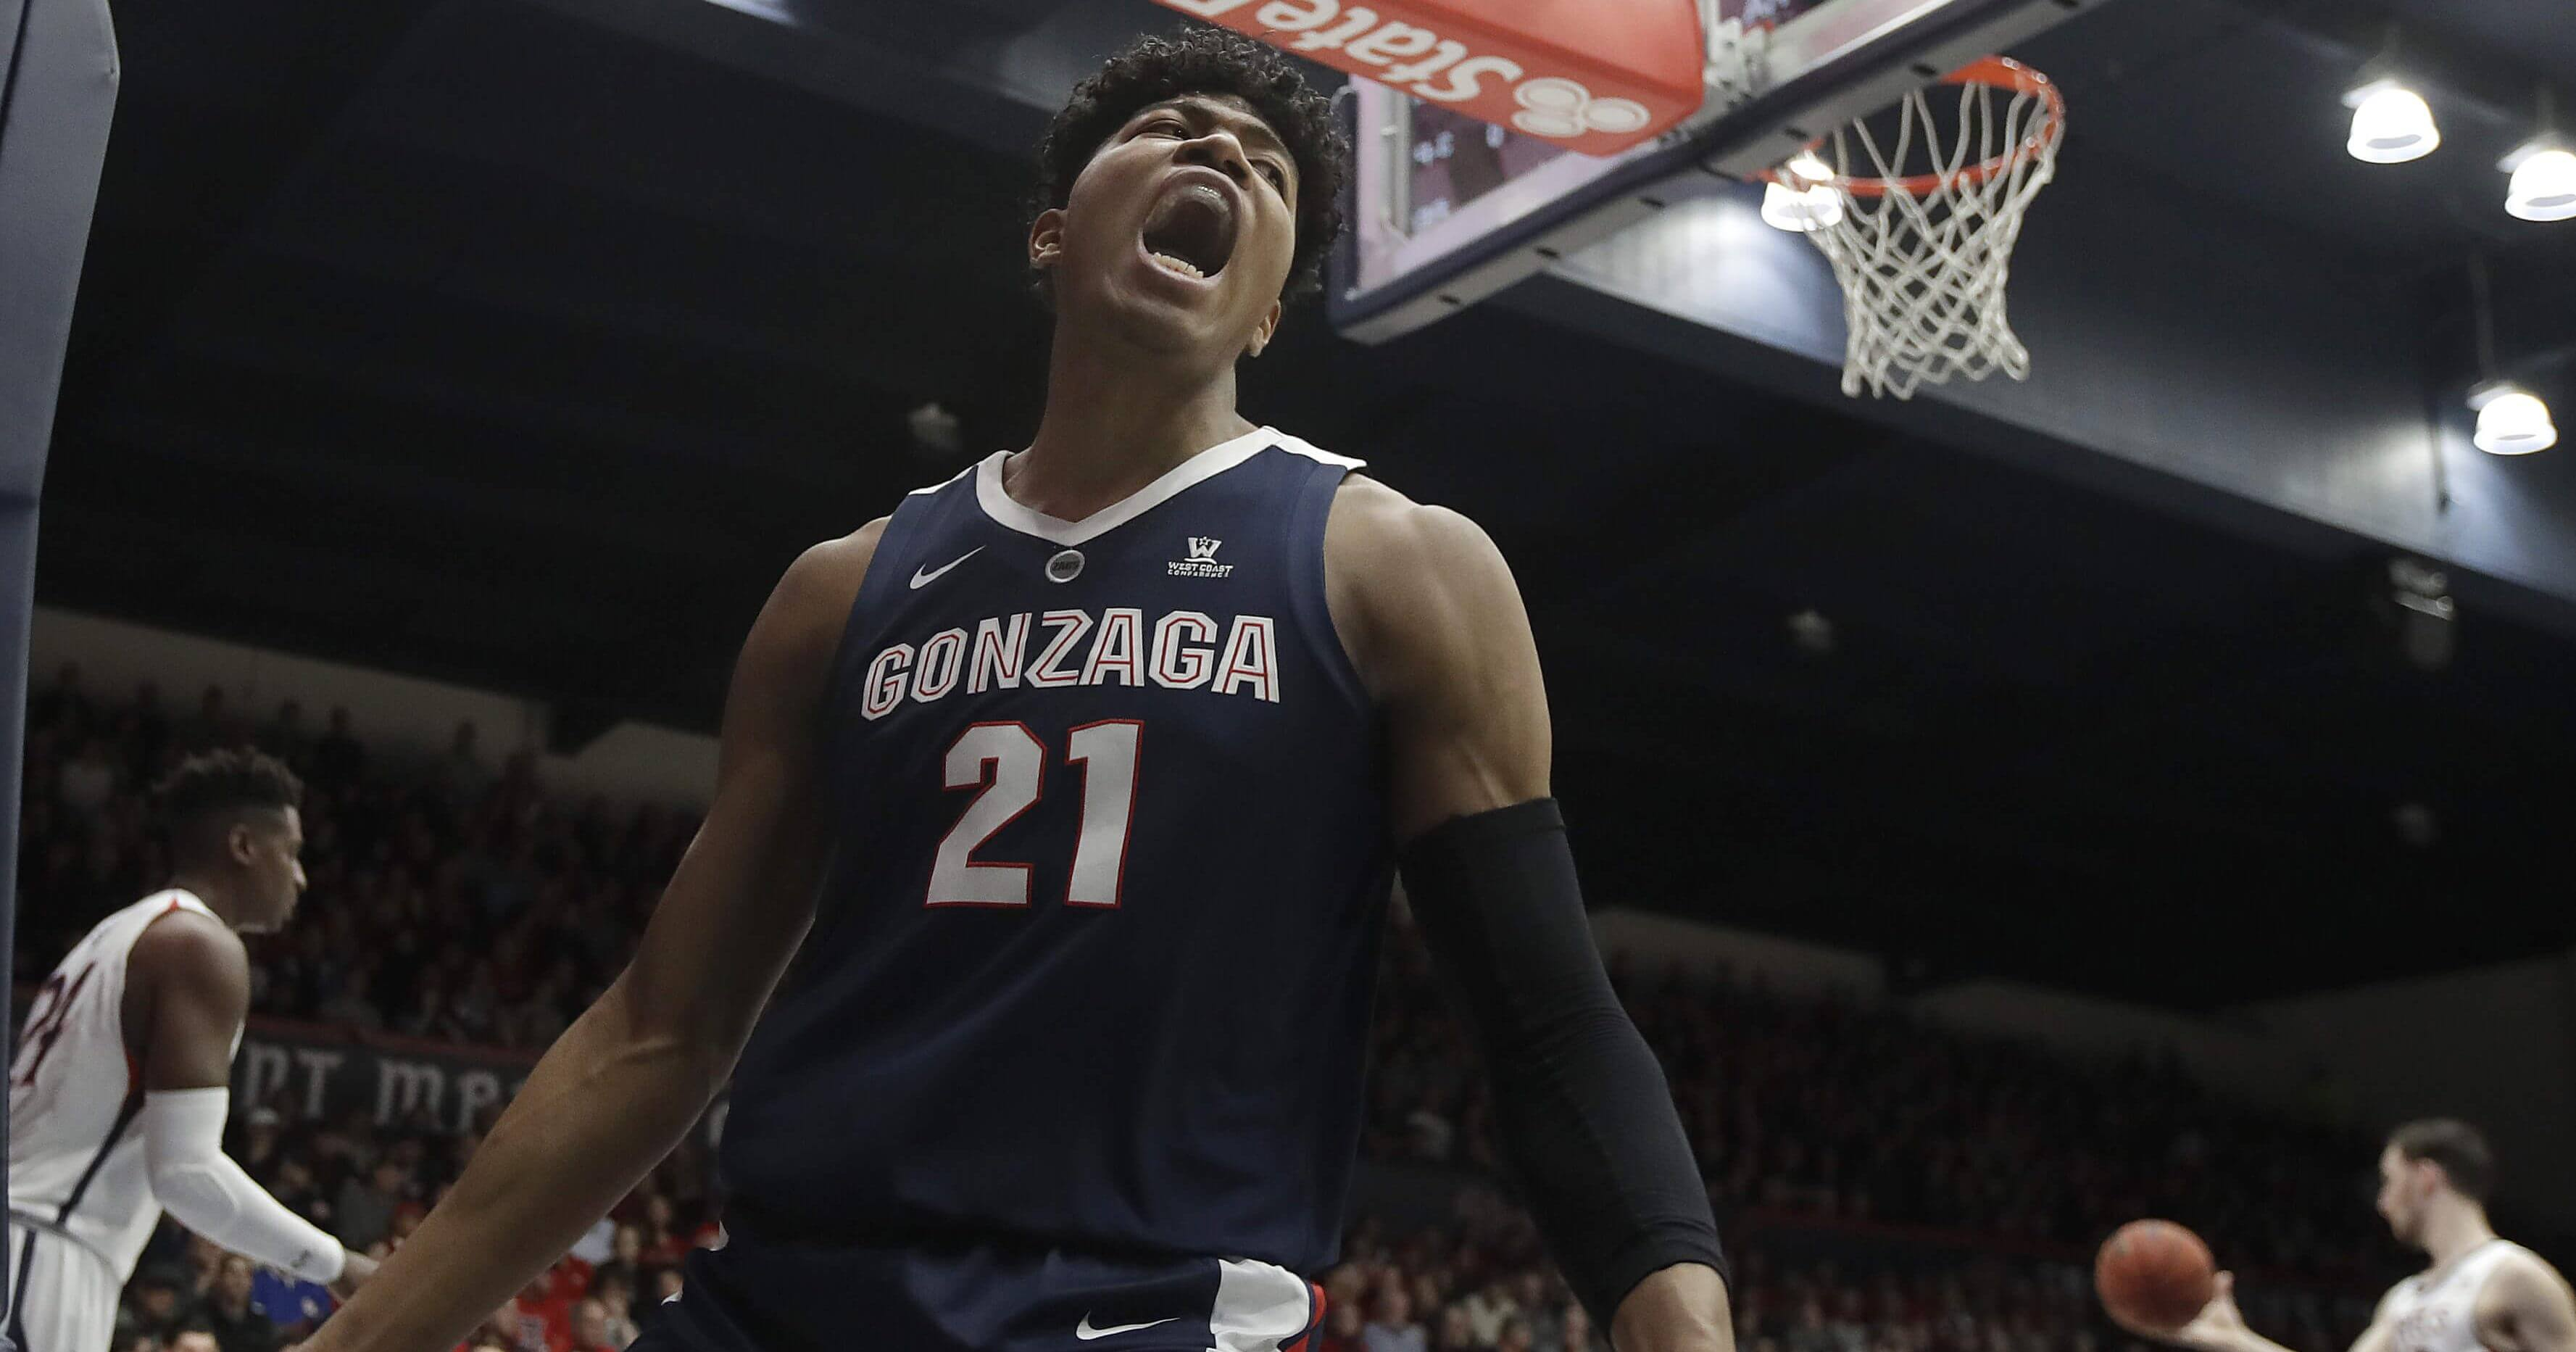 Gonzaga forward Rui Hachimura yells after dunking against Saint Mary's in Moraga, California on Saturday, March 2, 2019.